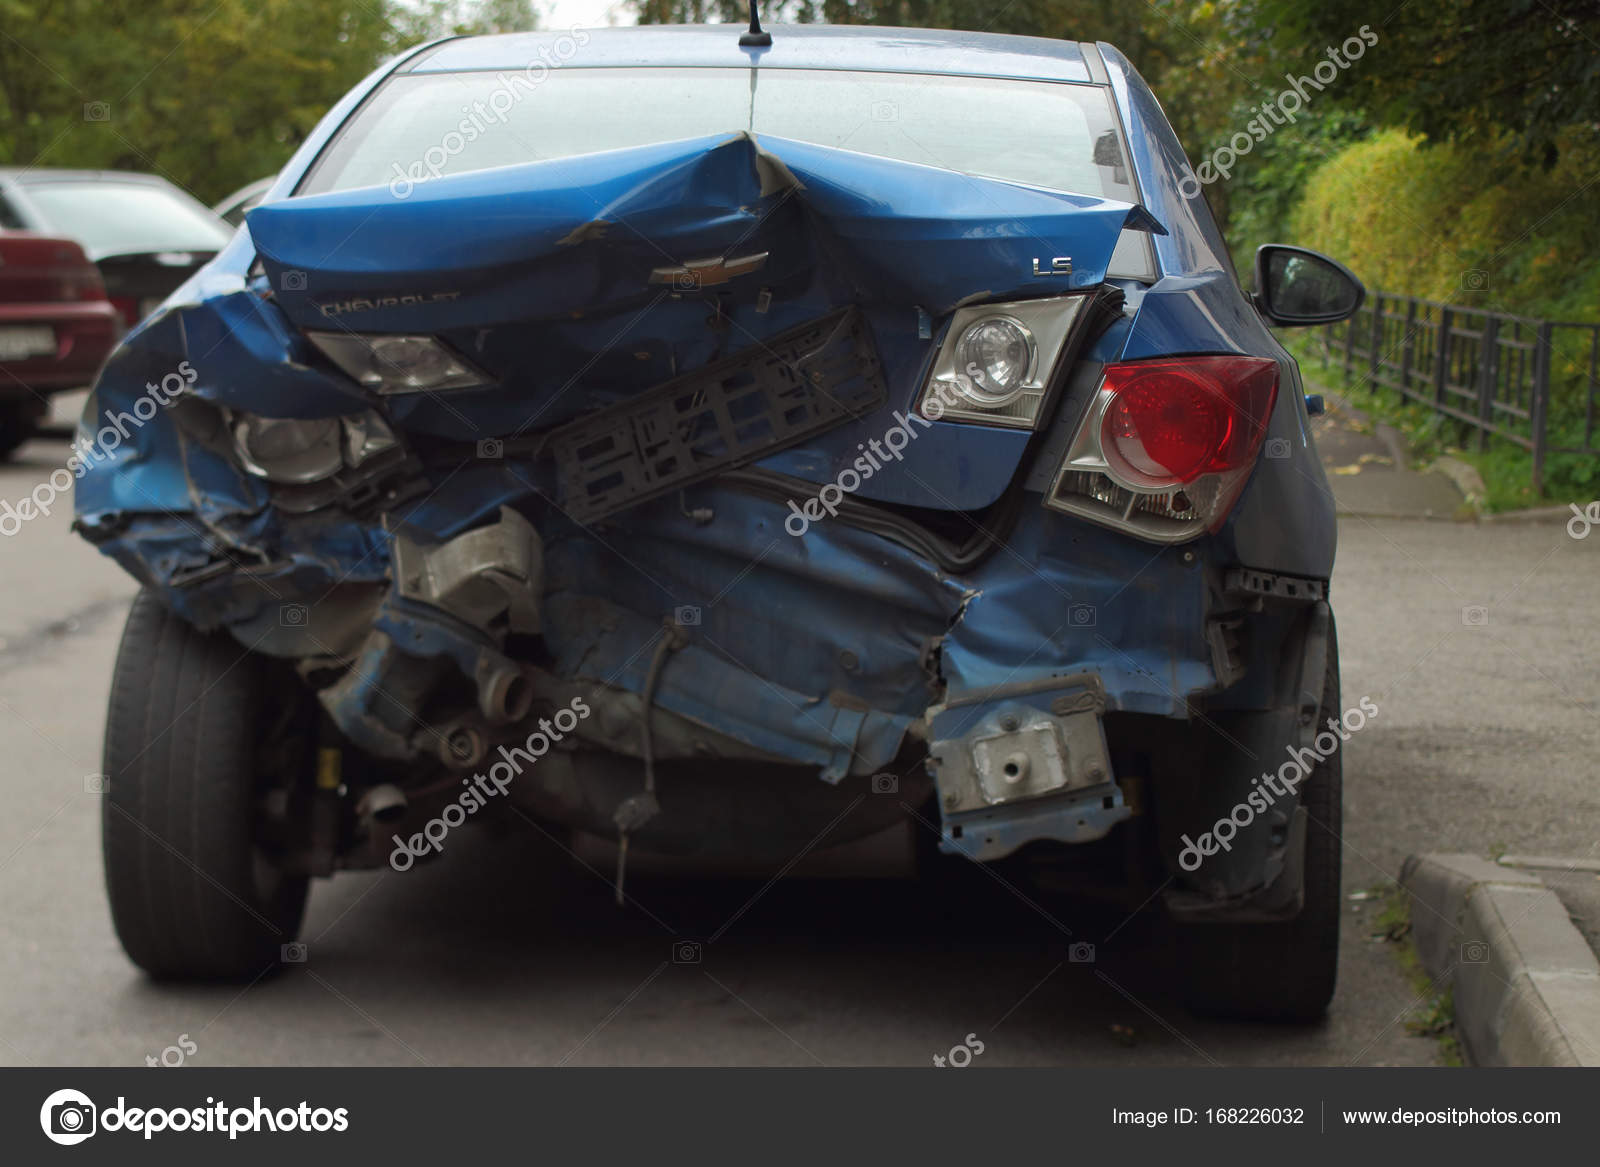 Unfall Notbremsung — Redaktionelles Stockfoto © mrivserg #168226032